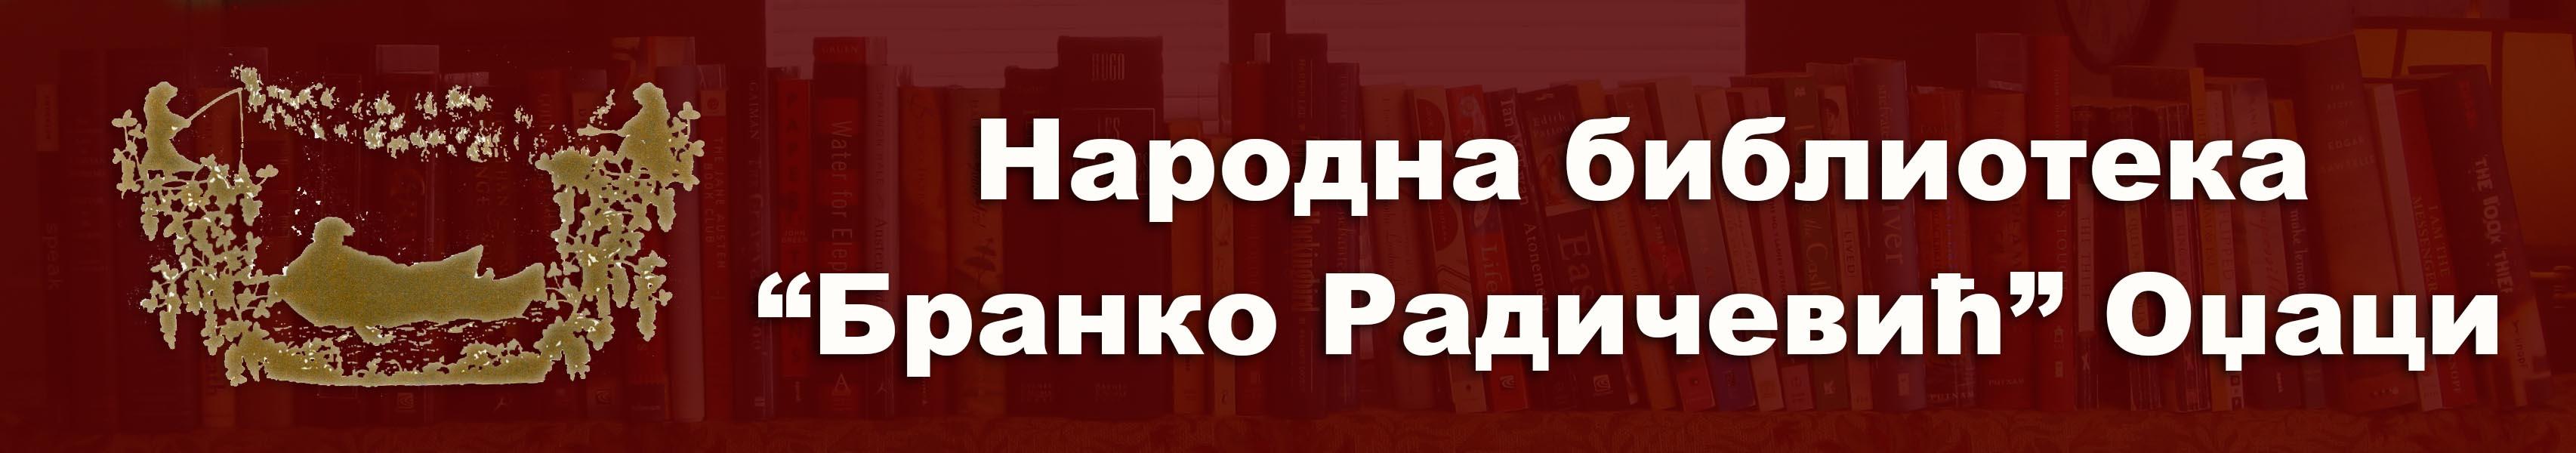 Biblioteka Branko Radicevic